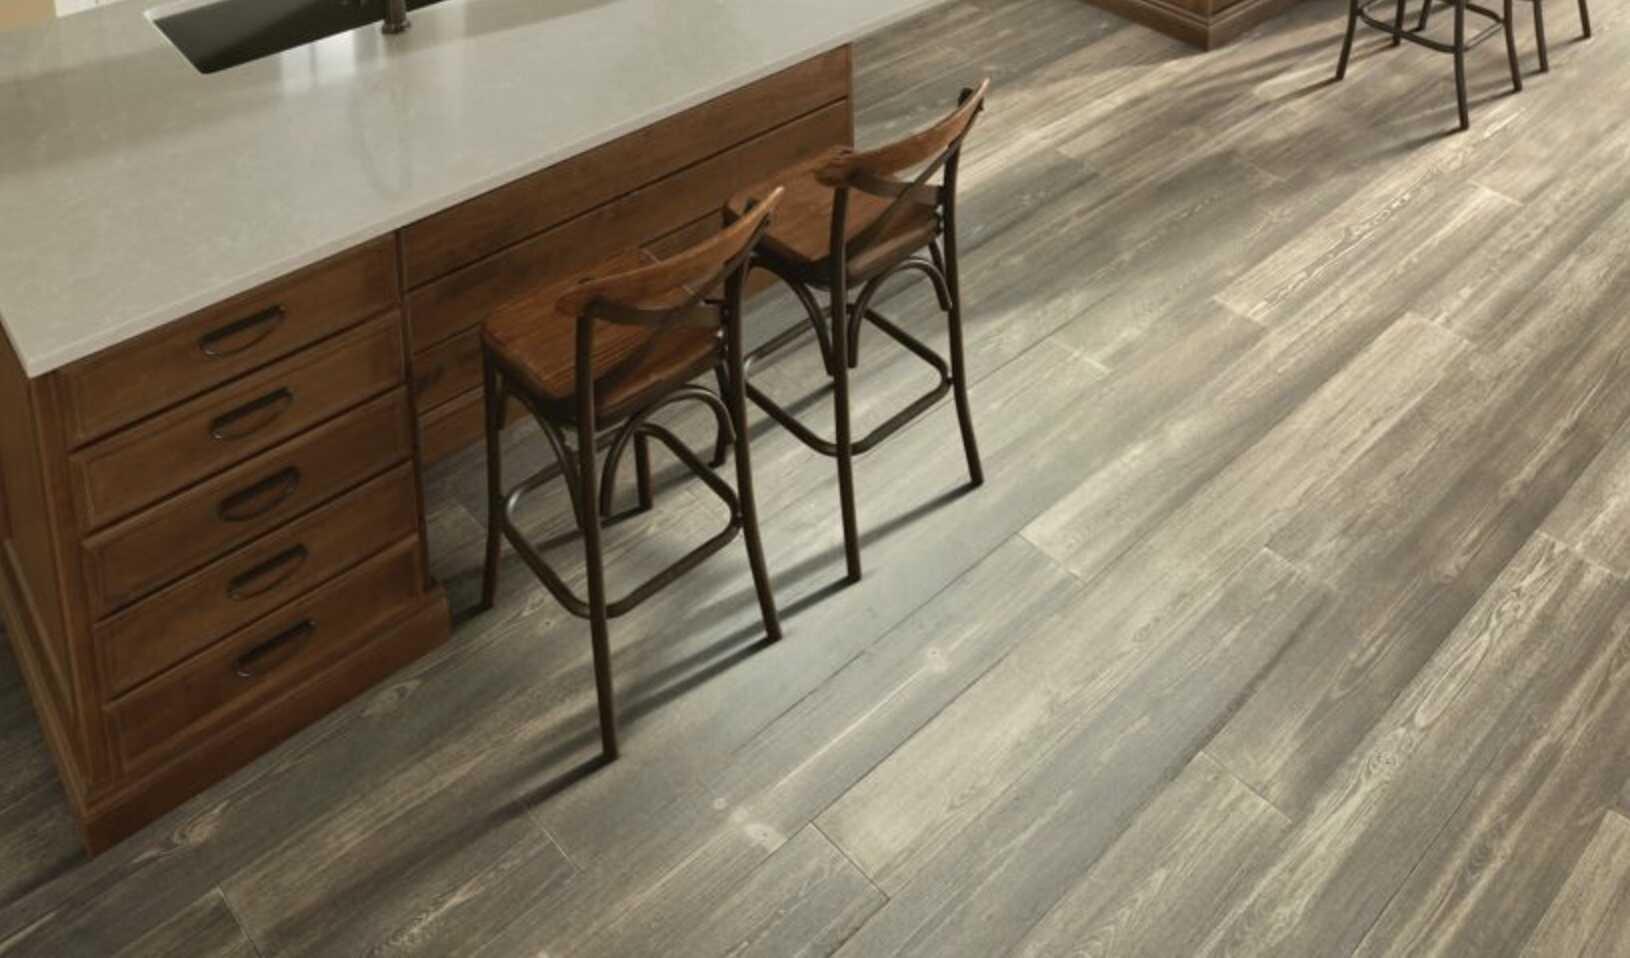 Kitchen stool | Floorscapes